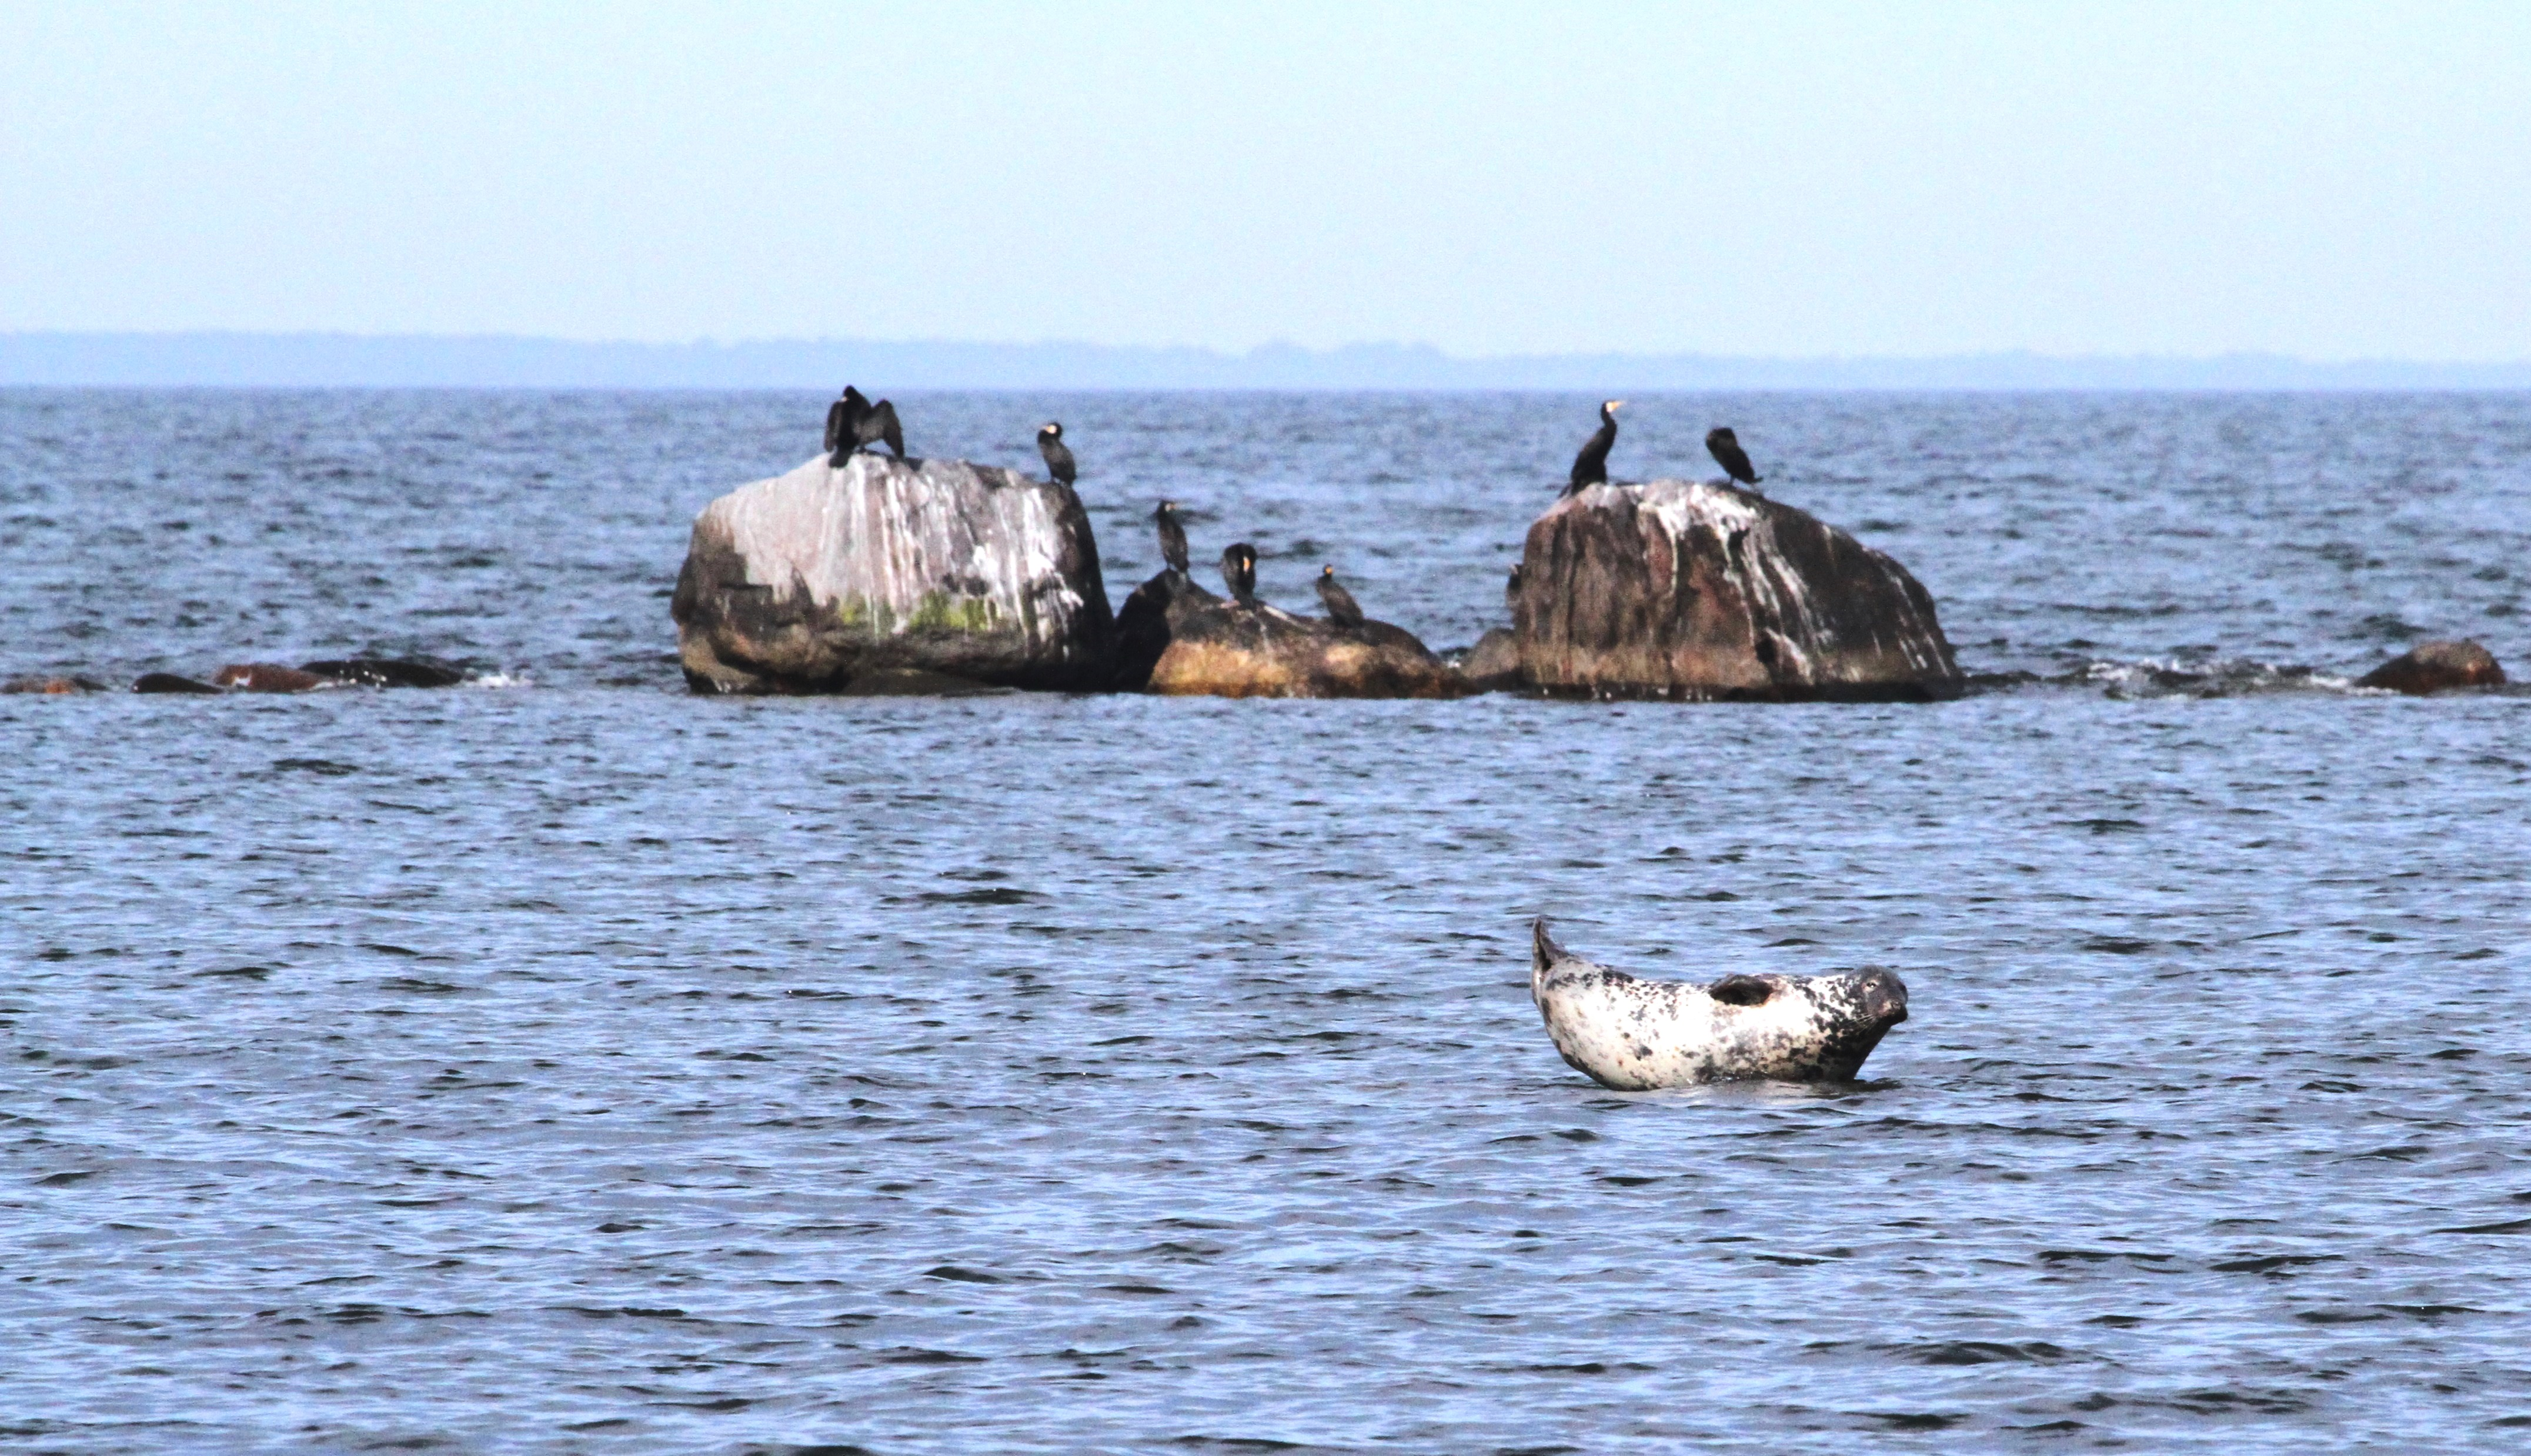 Tõnu Kauba. Diverse fauna near the Malusi islands where we go with our seal-watching trip.